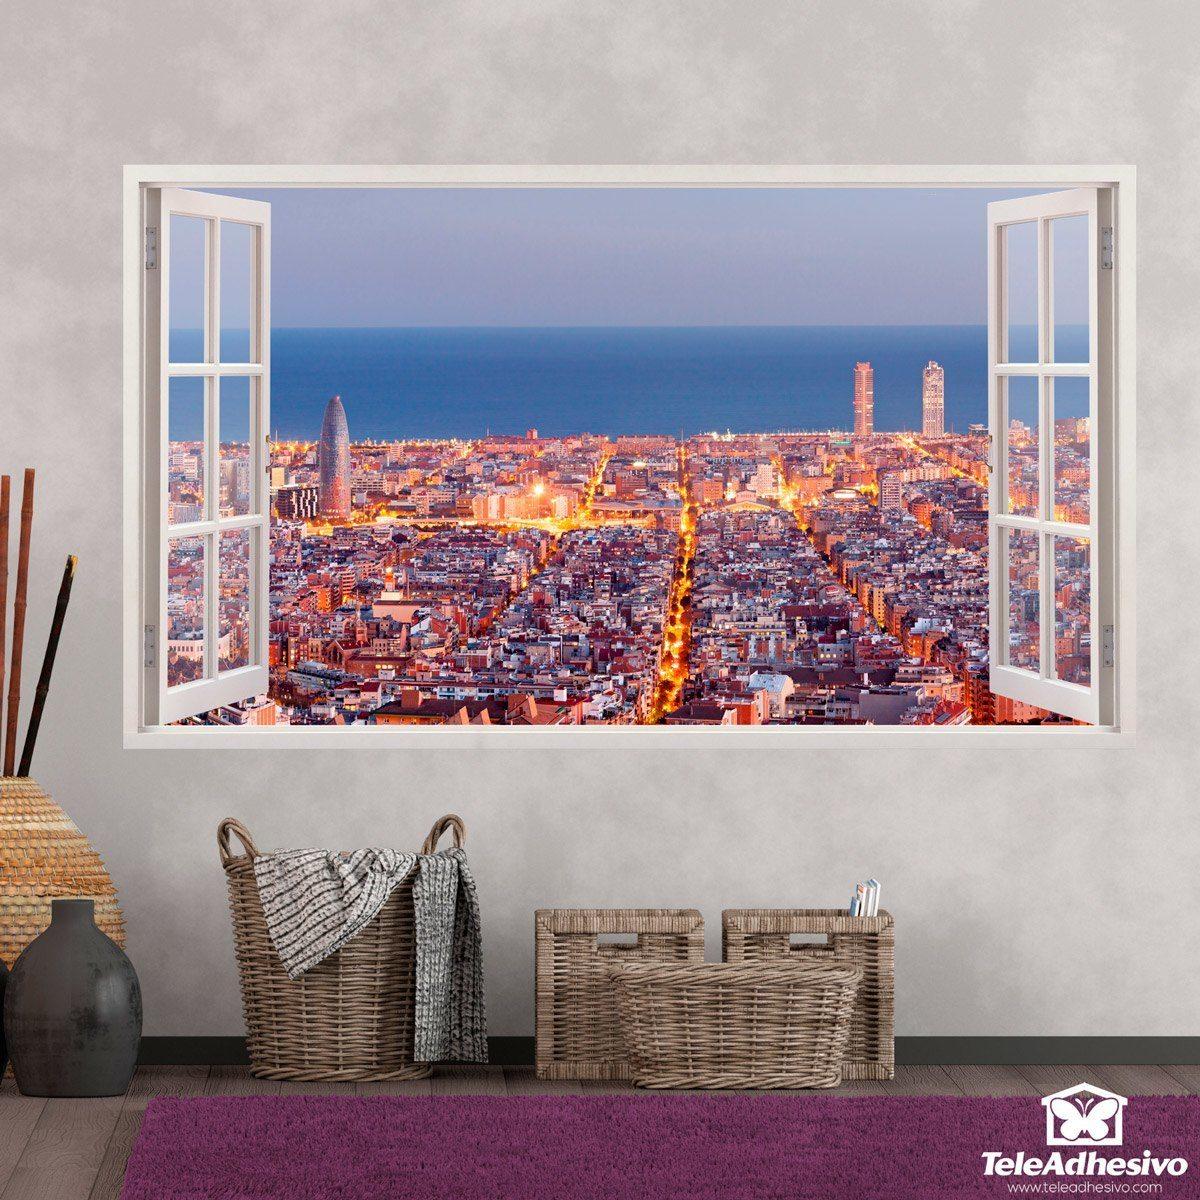 Pegatinas para decorar en forma de ventana teleadhesivo - Teleadhesivo vinilos decorativos espana ...